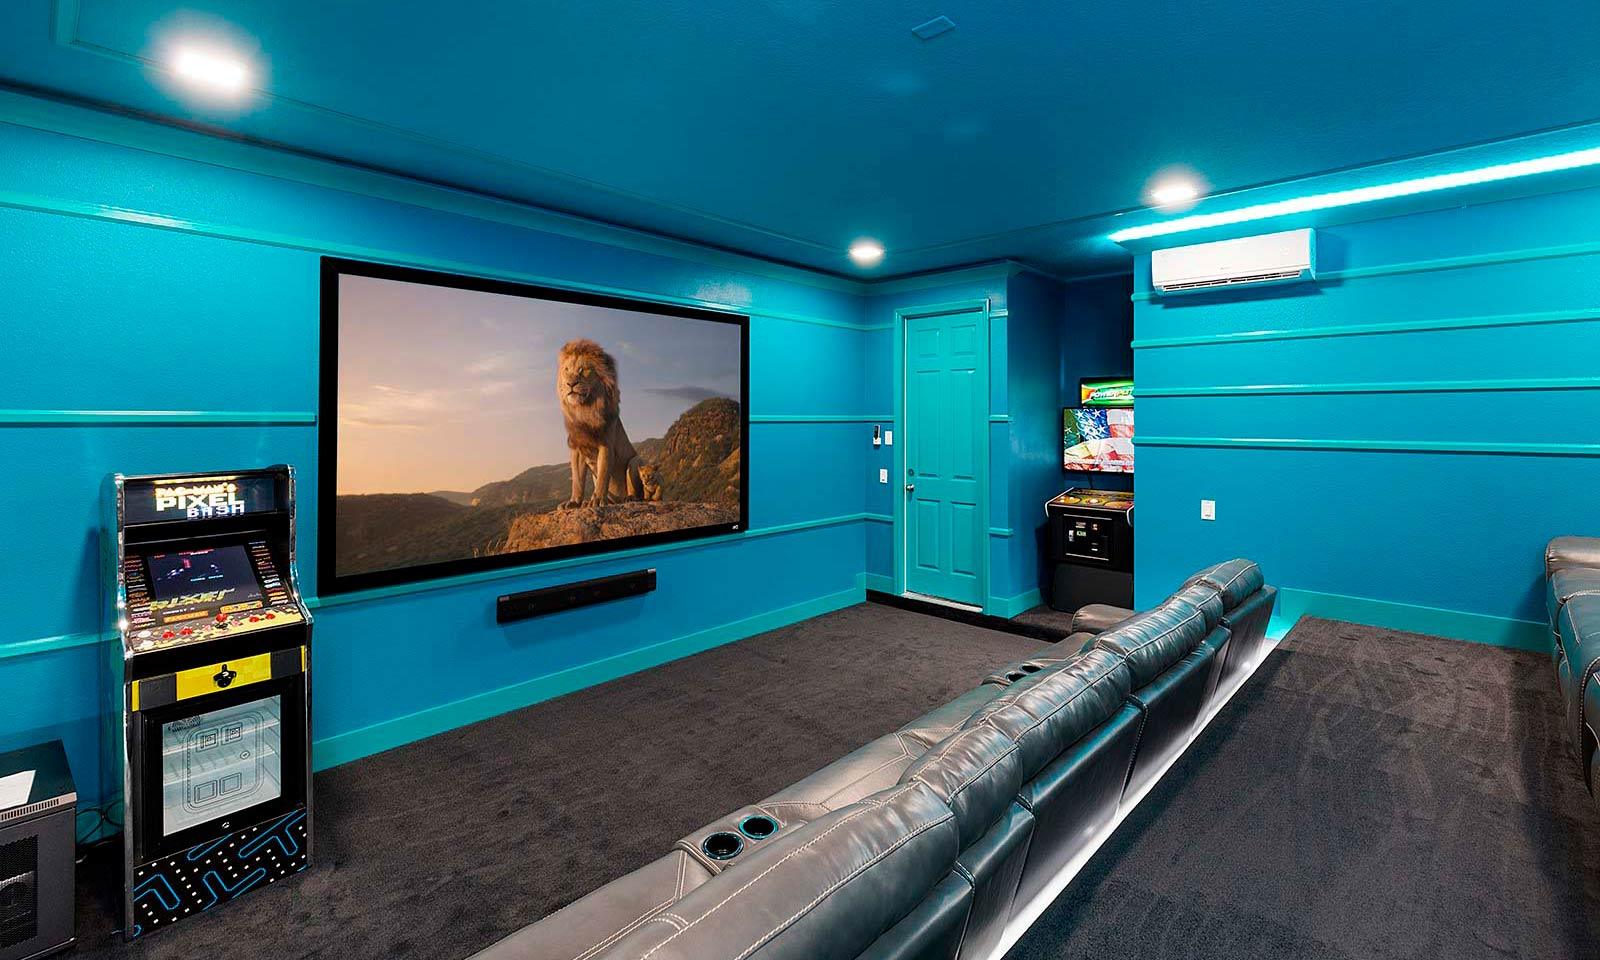 [amenities:Theater-Room:3] Theater Room